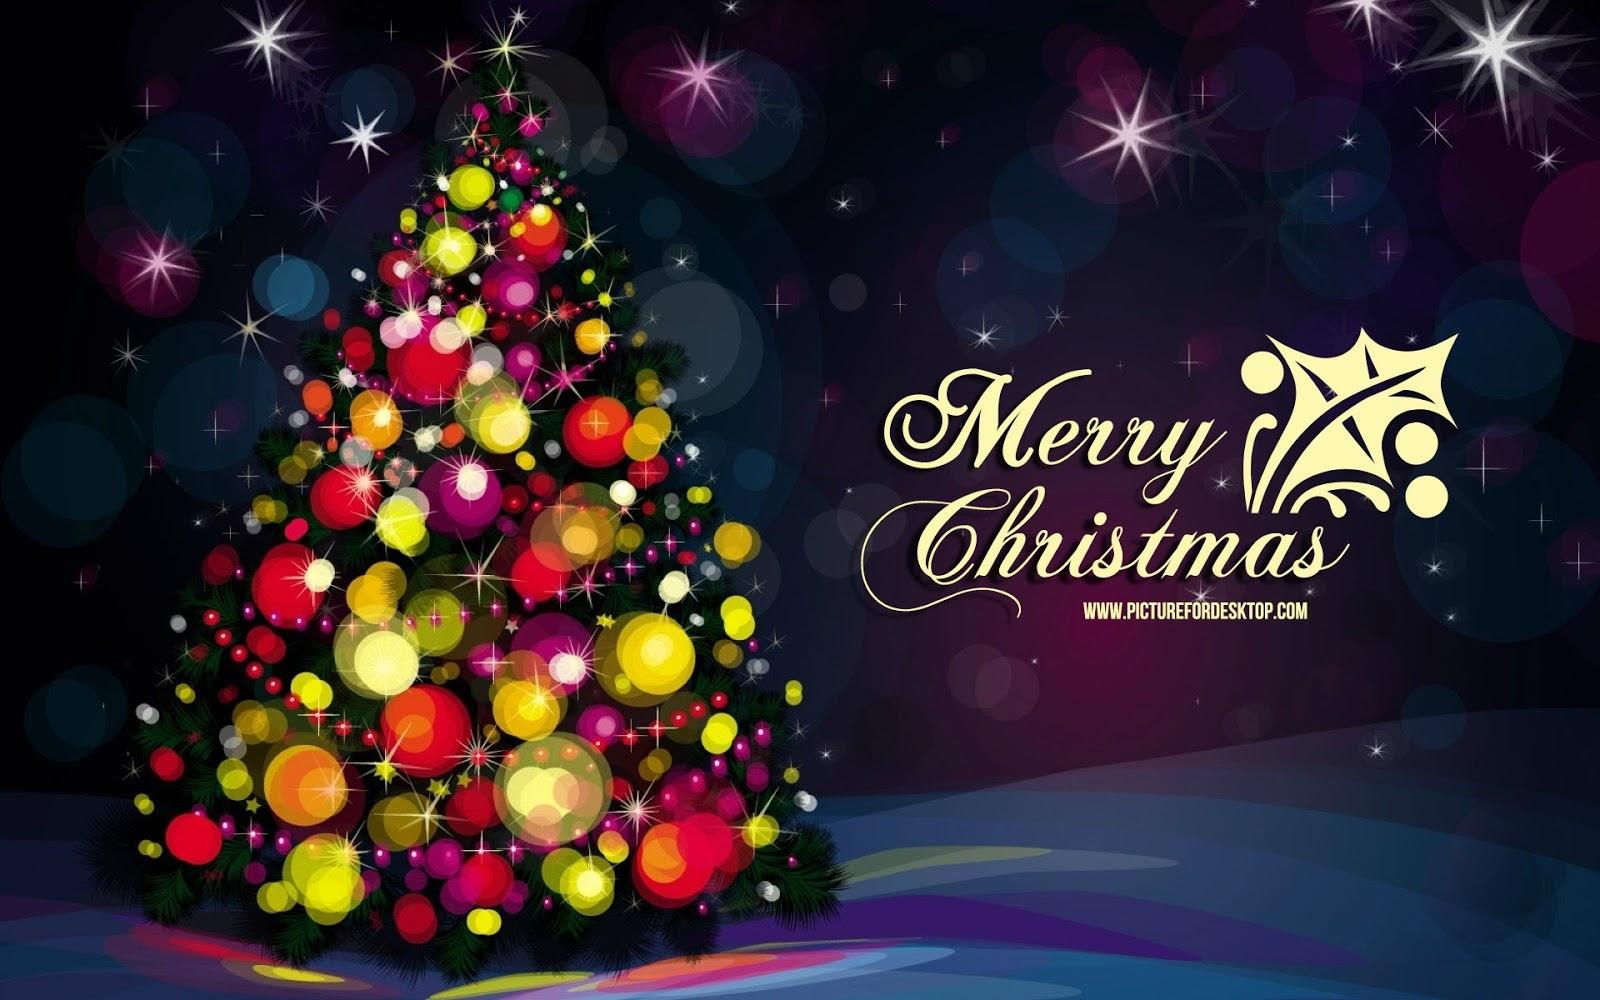 Merry Christmas Messages X Mas Christmas Greetings Christmas Tree